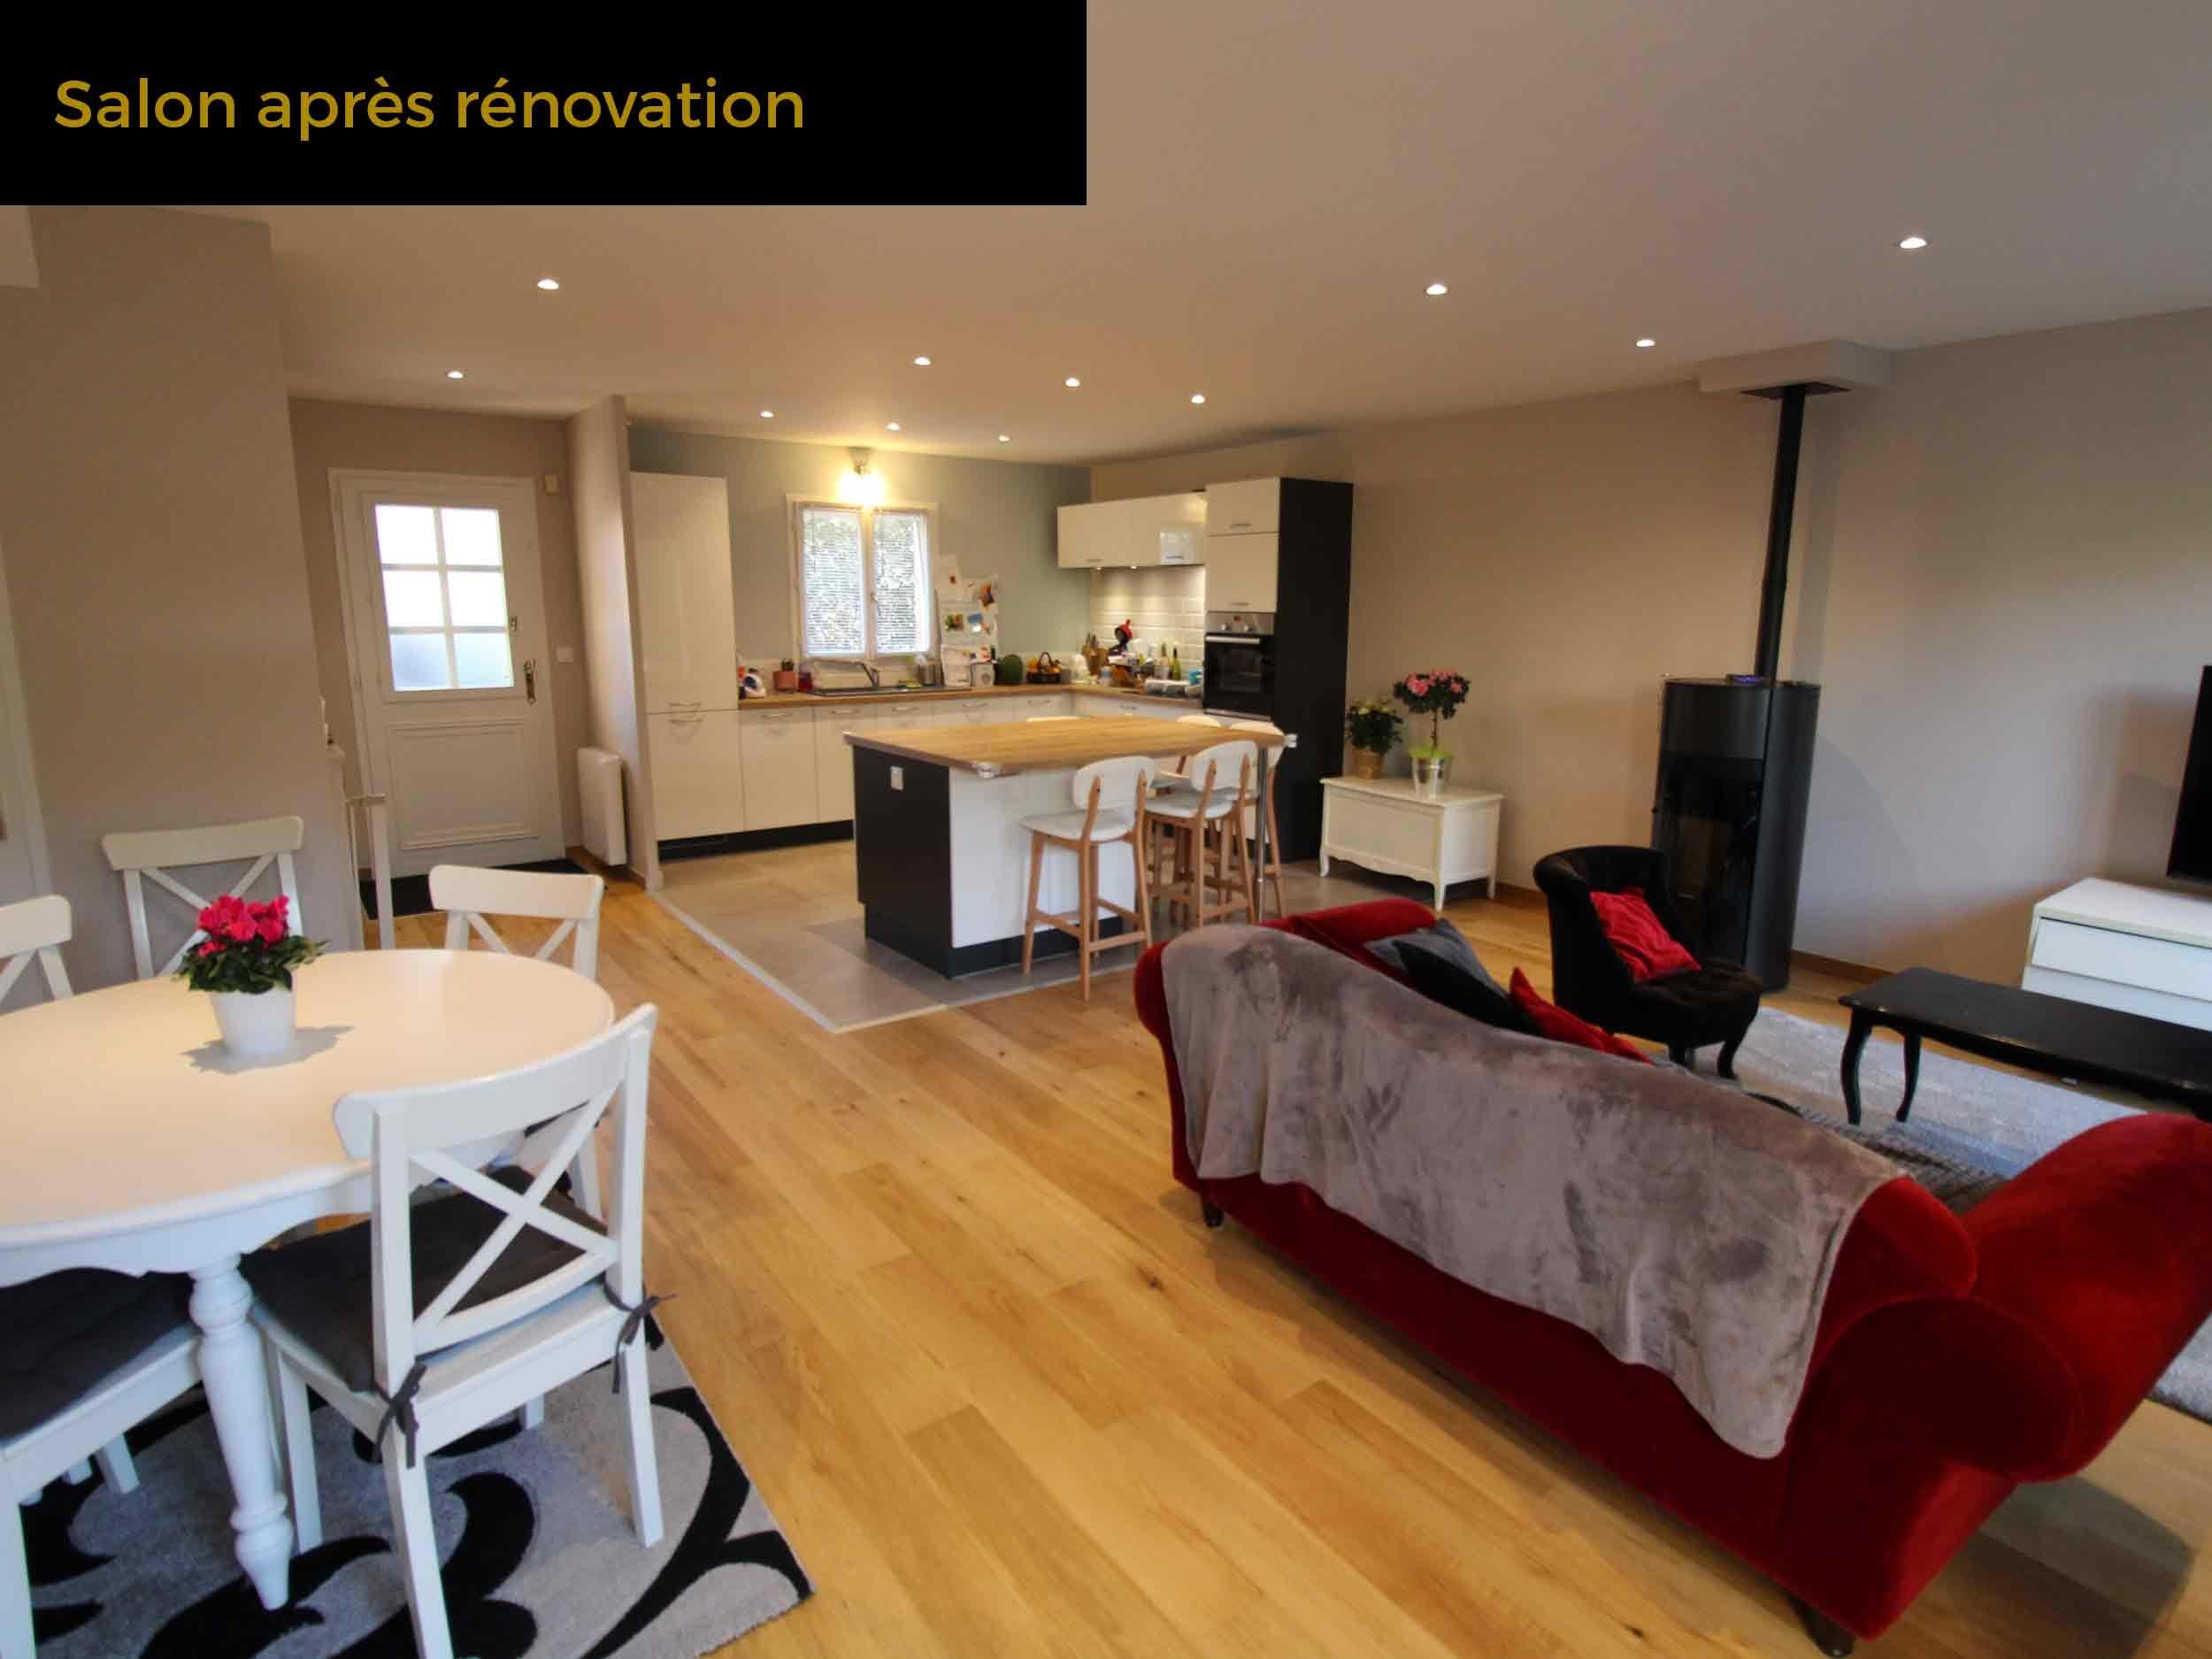 1c-salon-apres-renovation-champagne